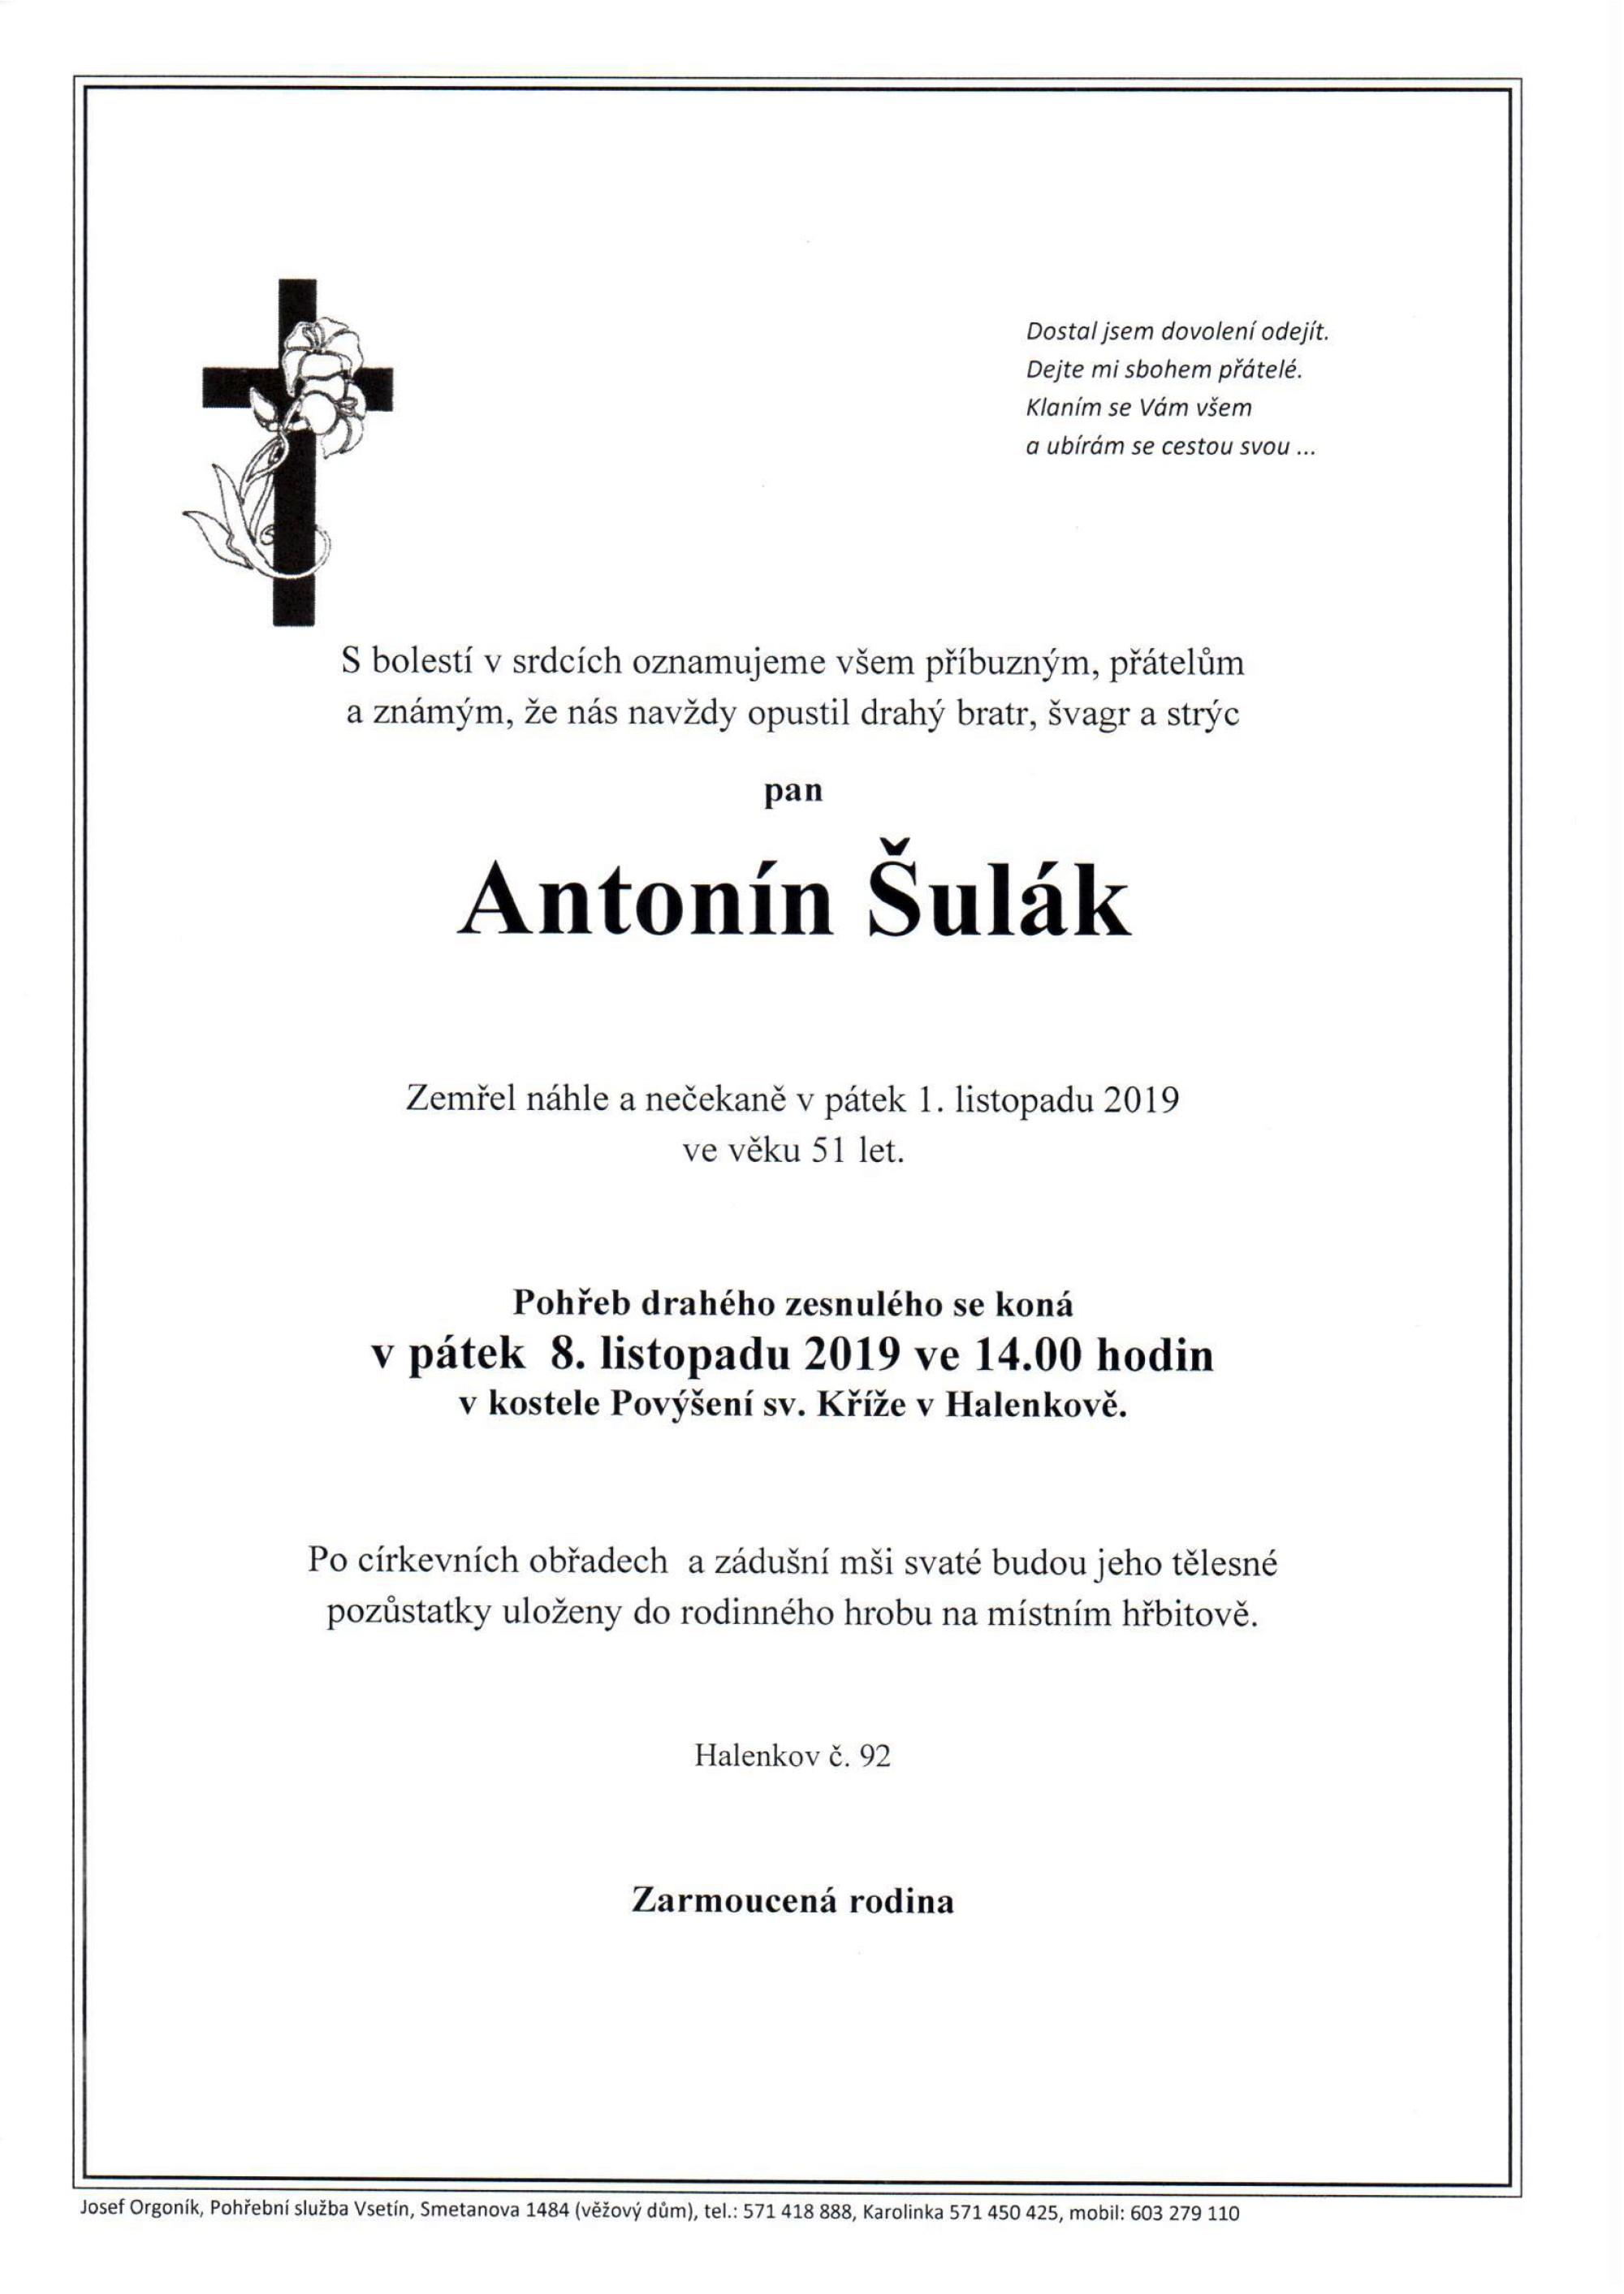 Antonín Šulák